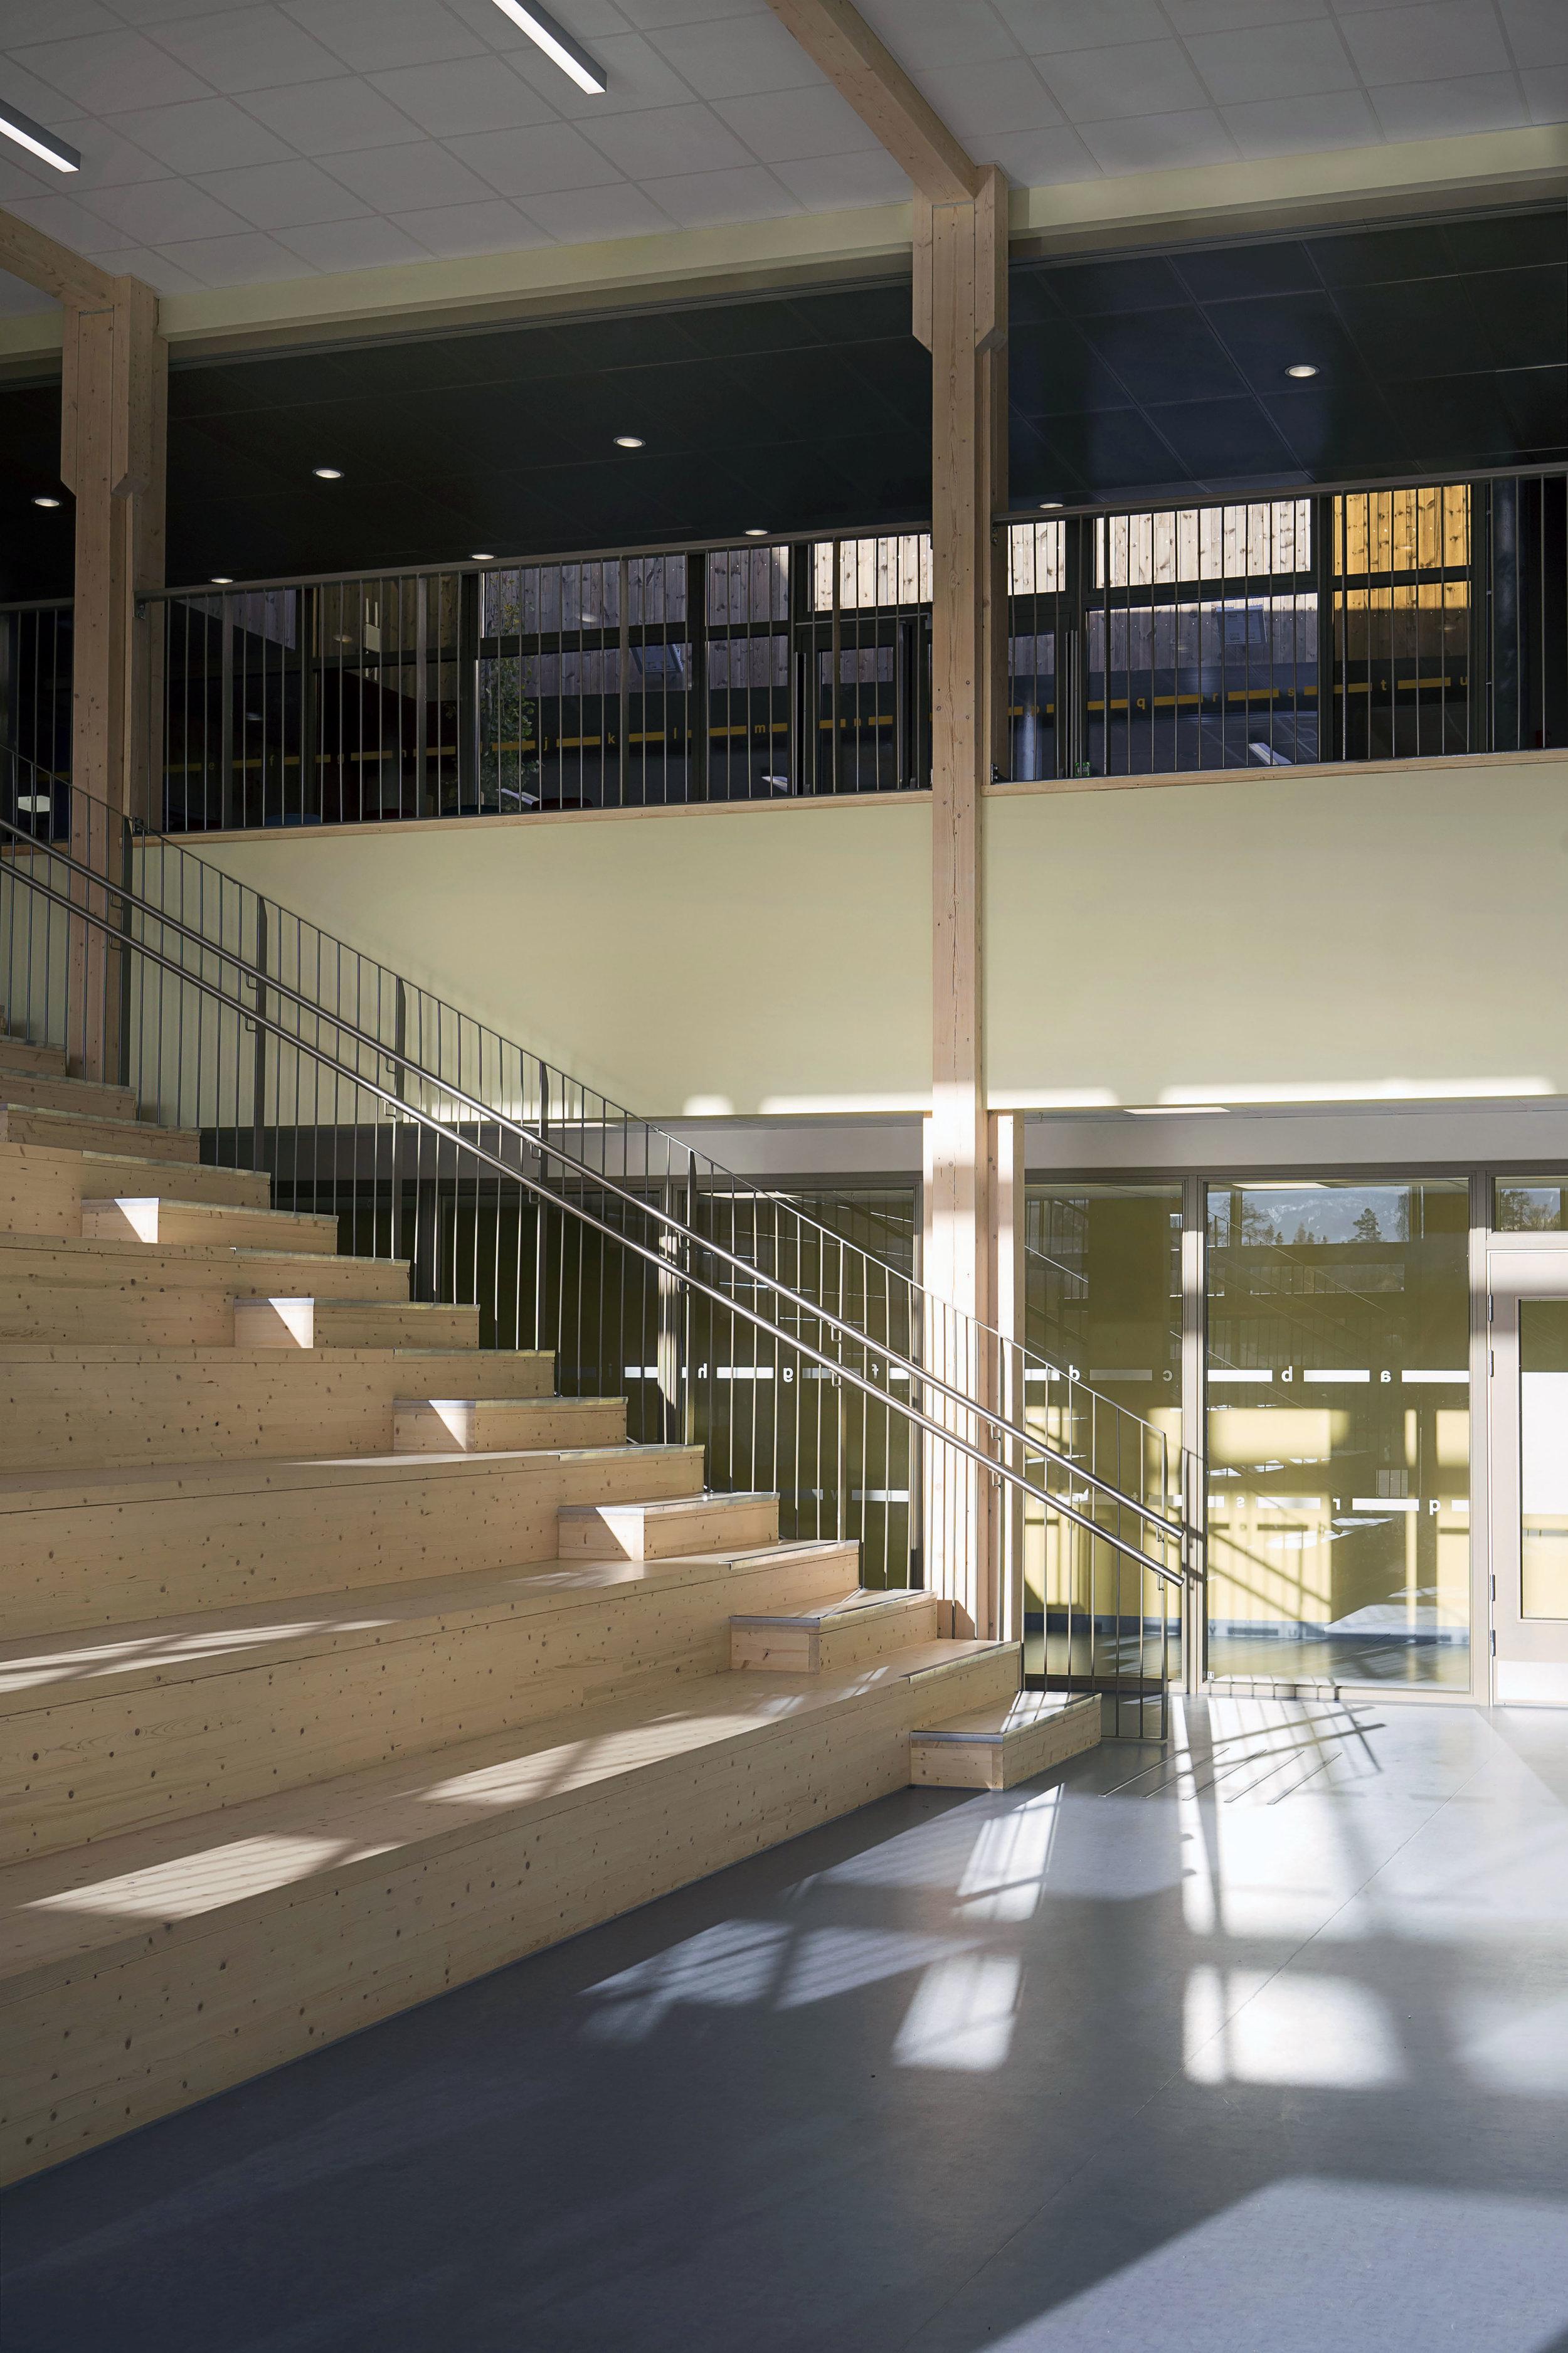 Planforum Arkitekter_Ytre Enebakk skole_Foto Eli Haugen Sandnes_Amfi 03.jpg